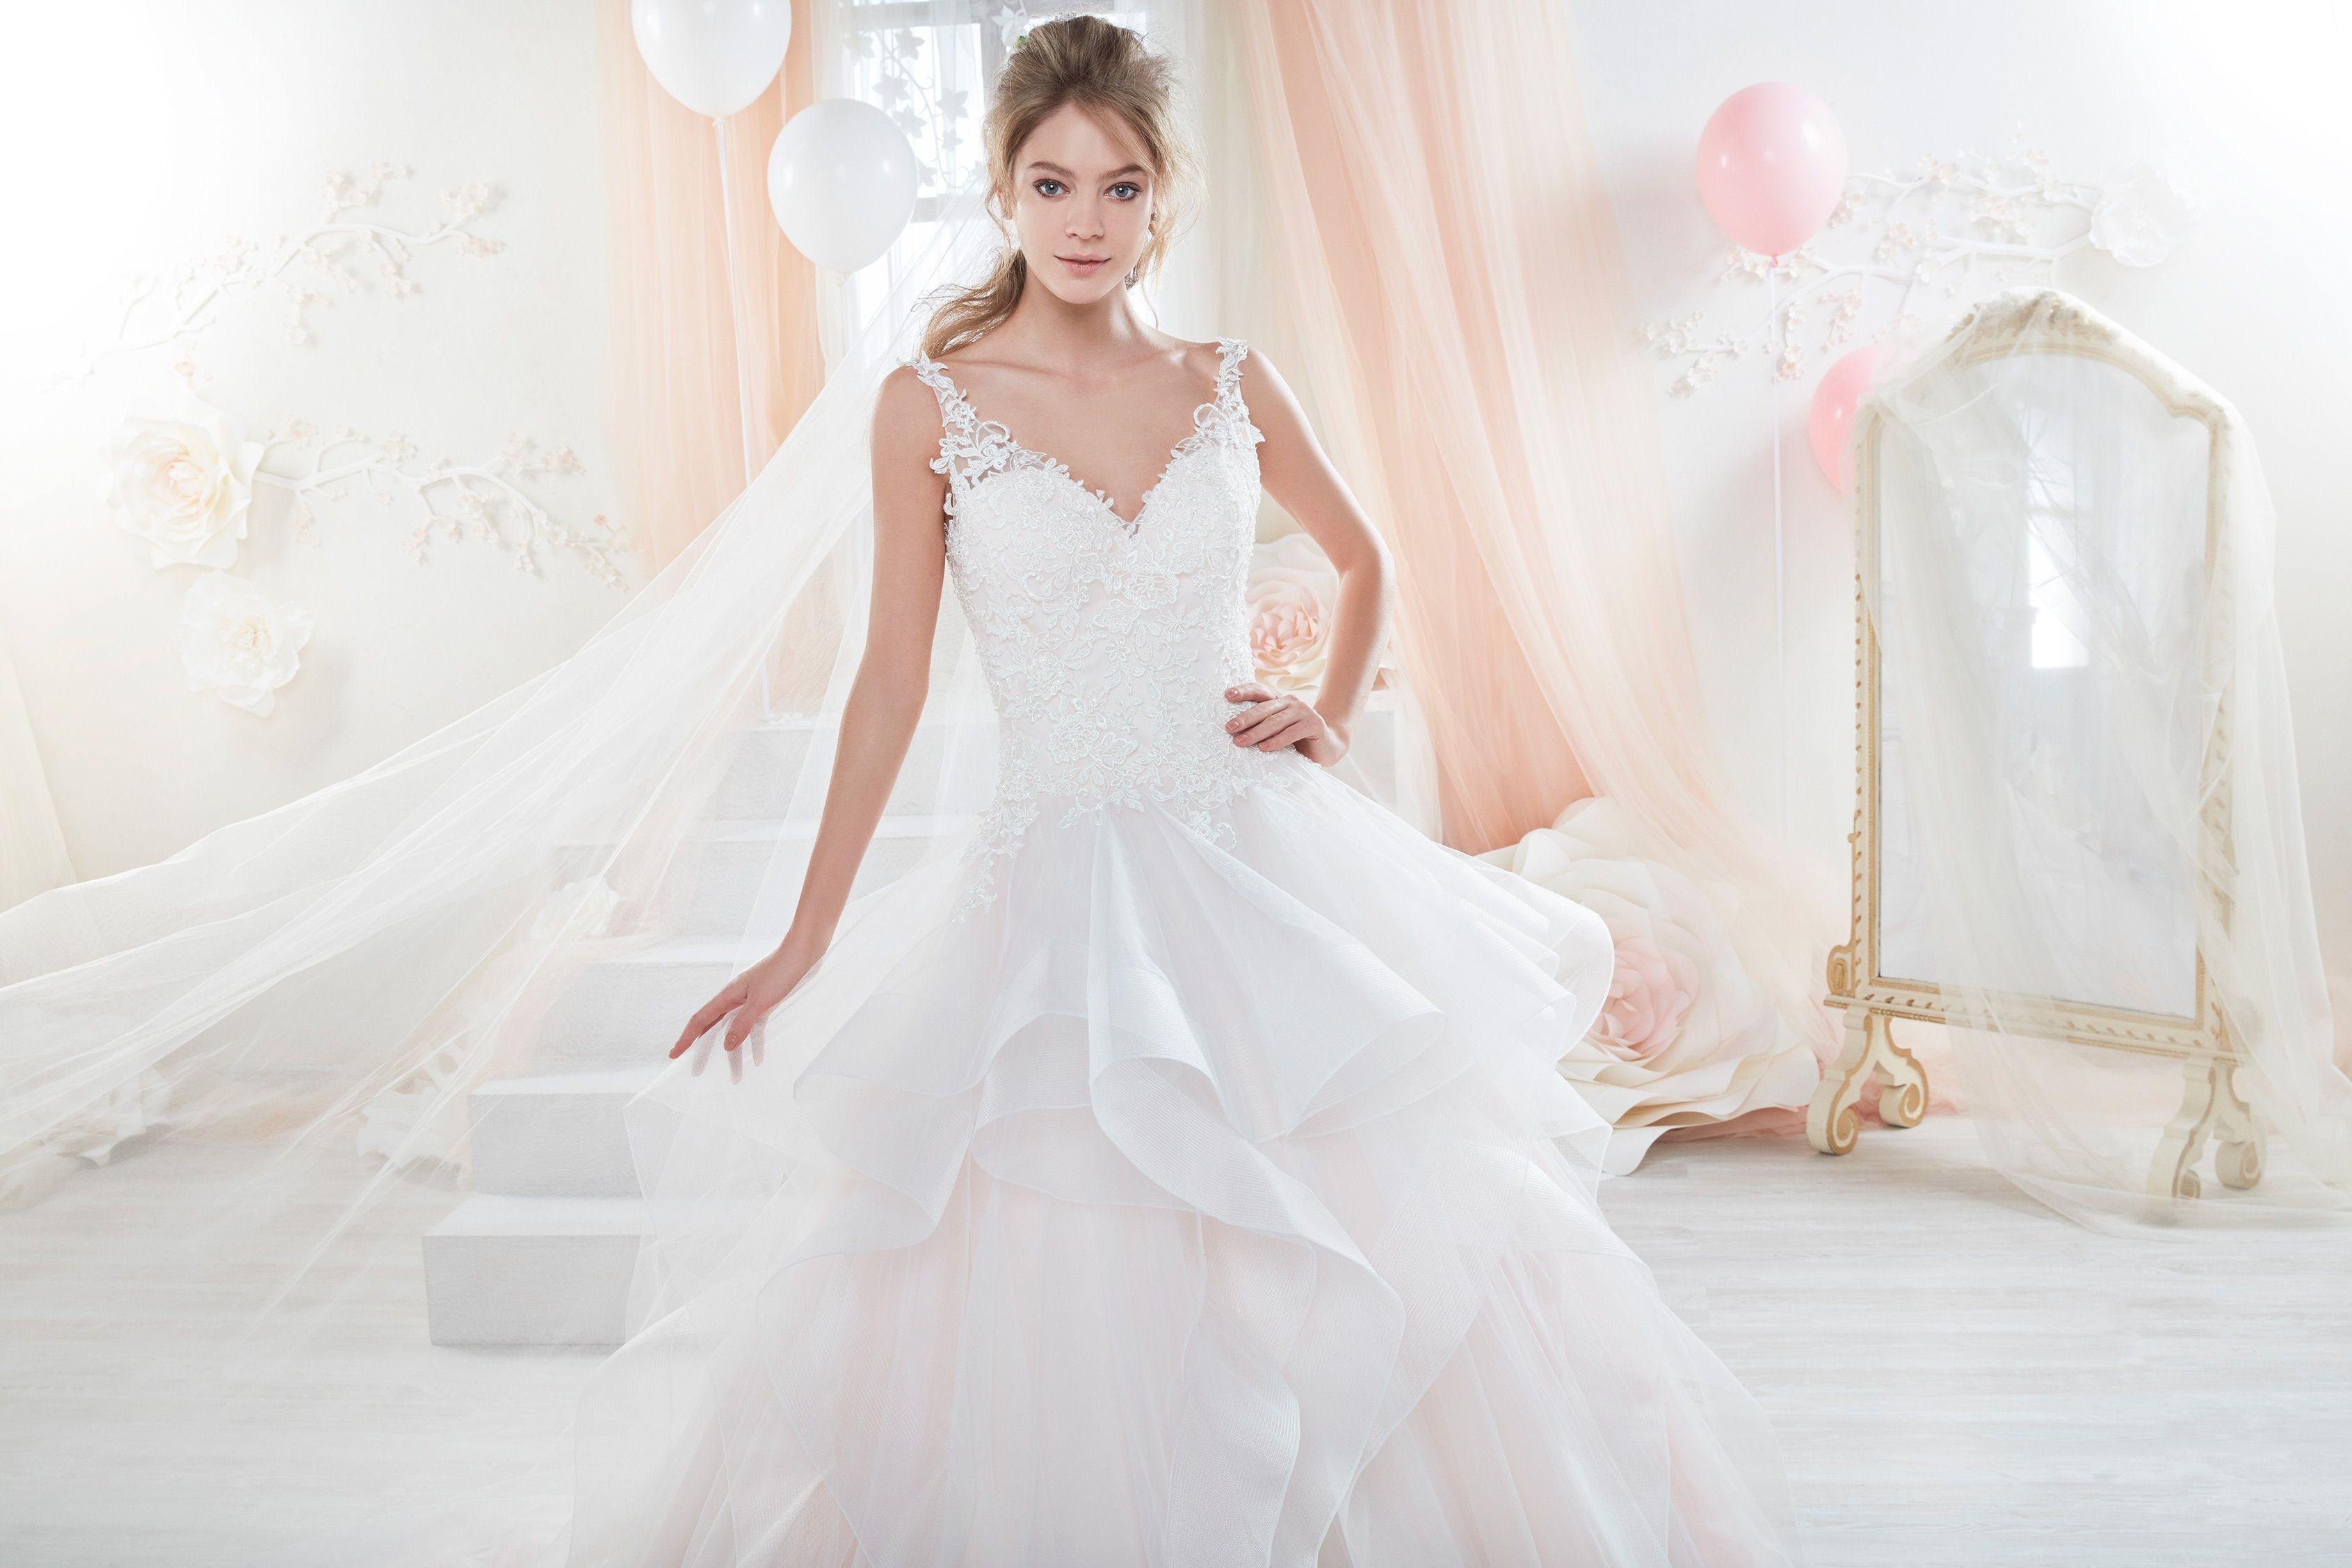 Wedding Dress Nicole - Collection COLET COAB18319 2018 | Bridal ...